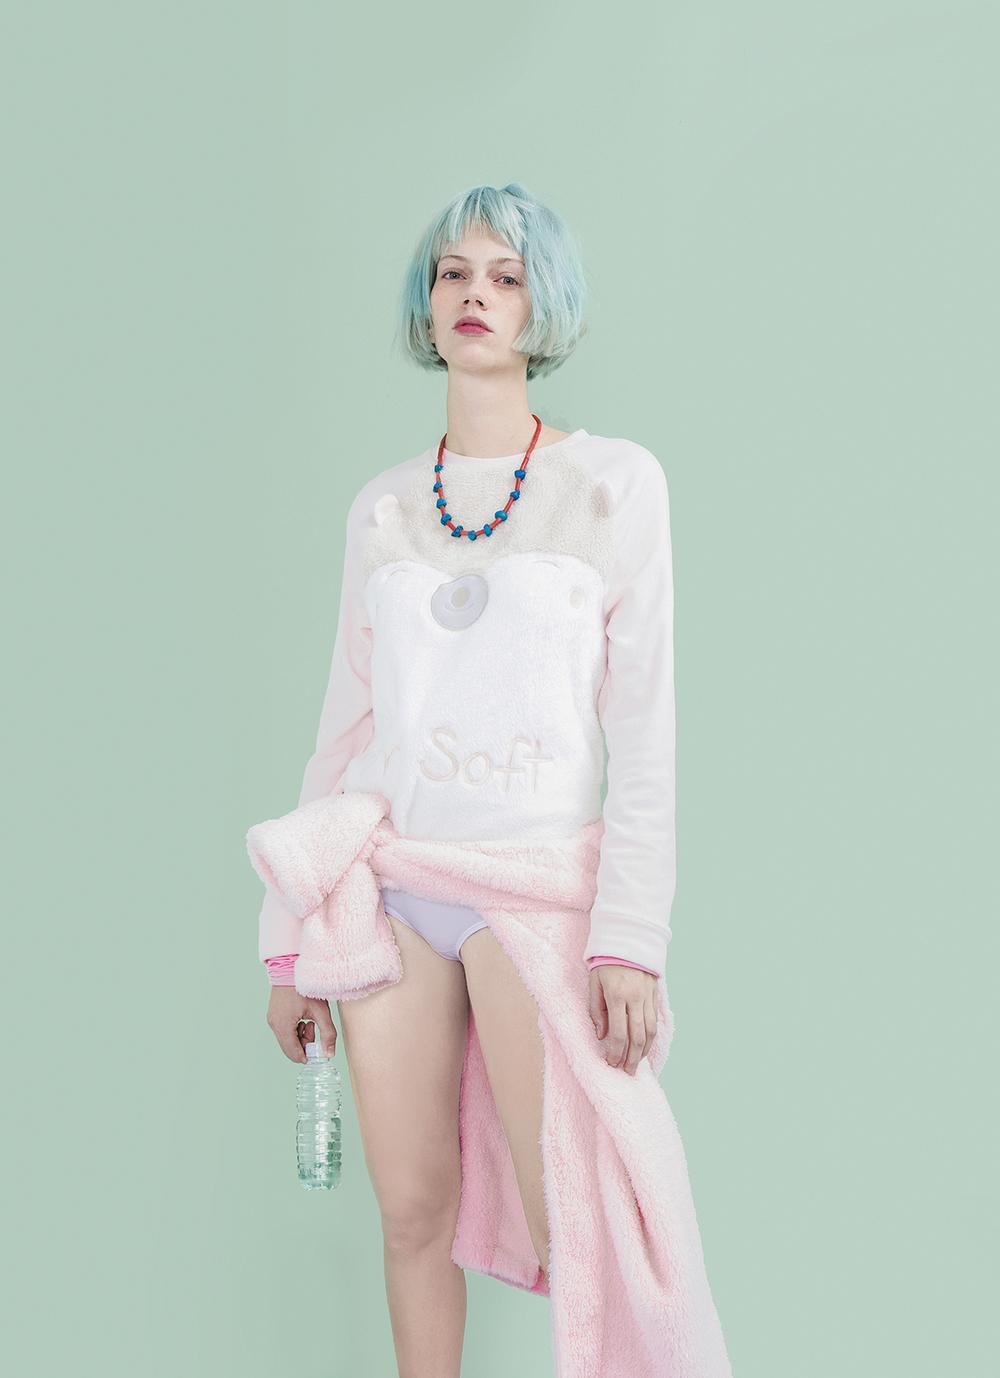 Lookbook sleepwear Oysho by Ernesto Artillo  (9).jpg